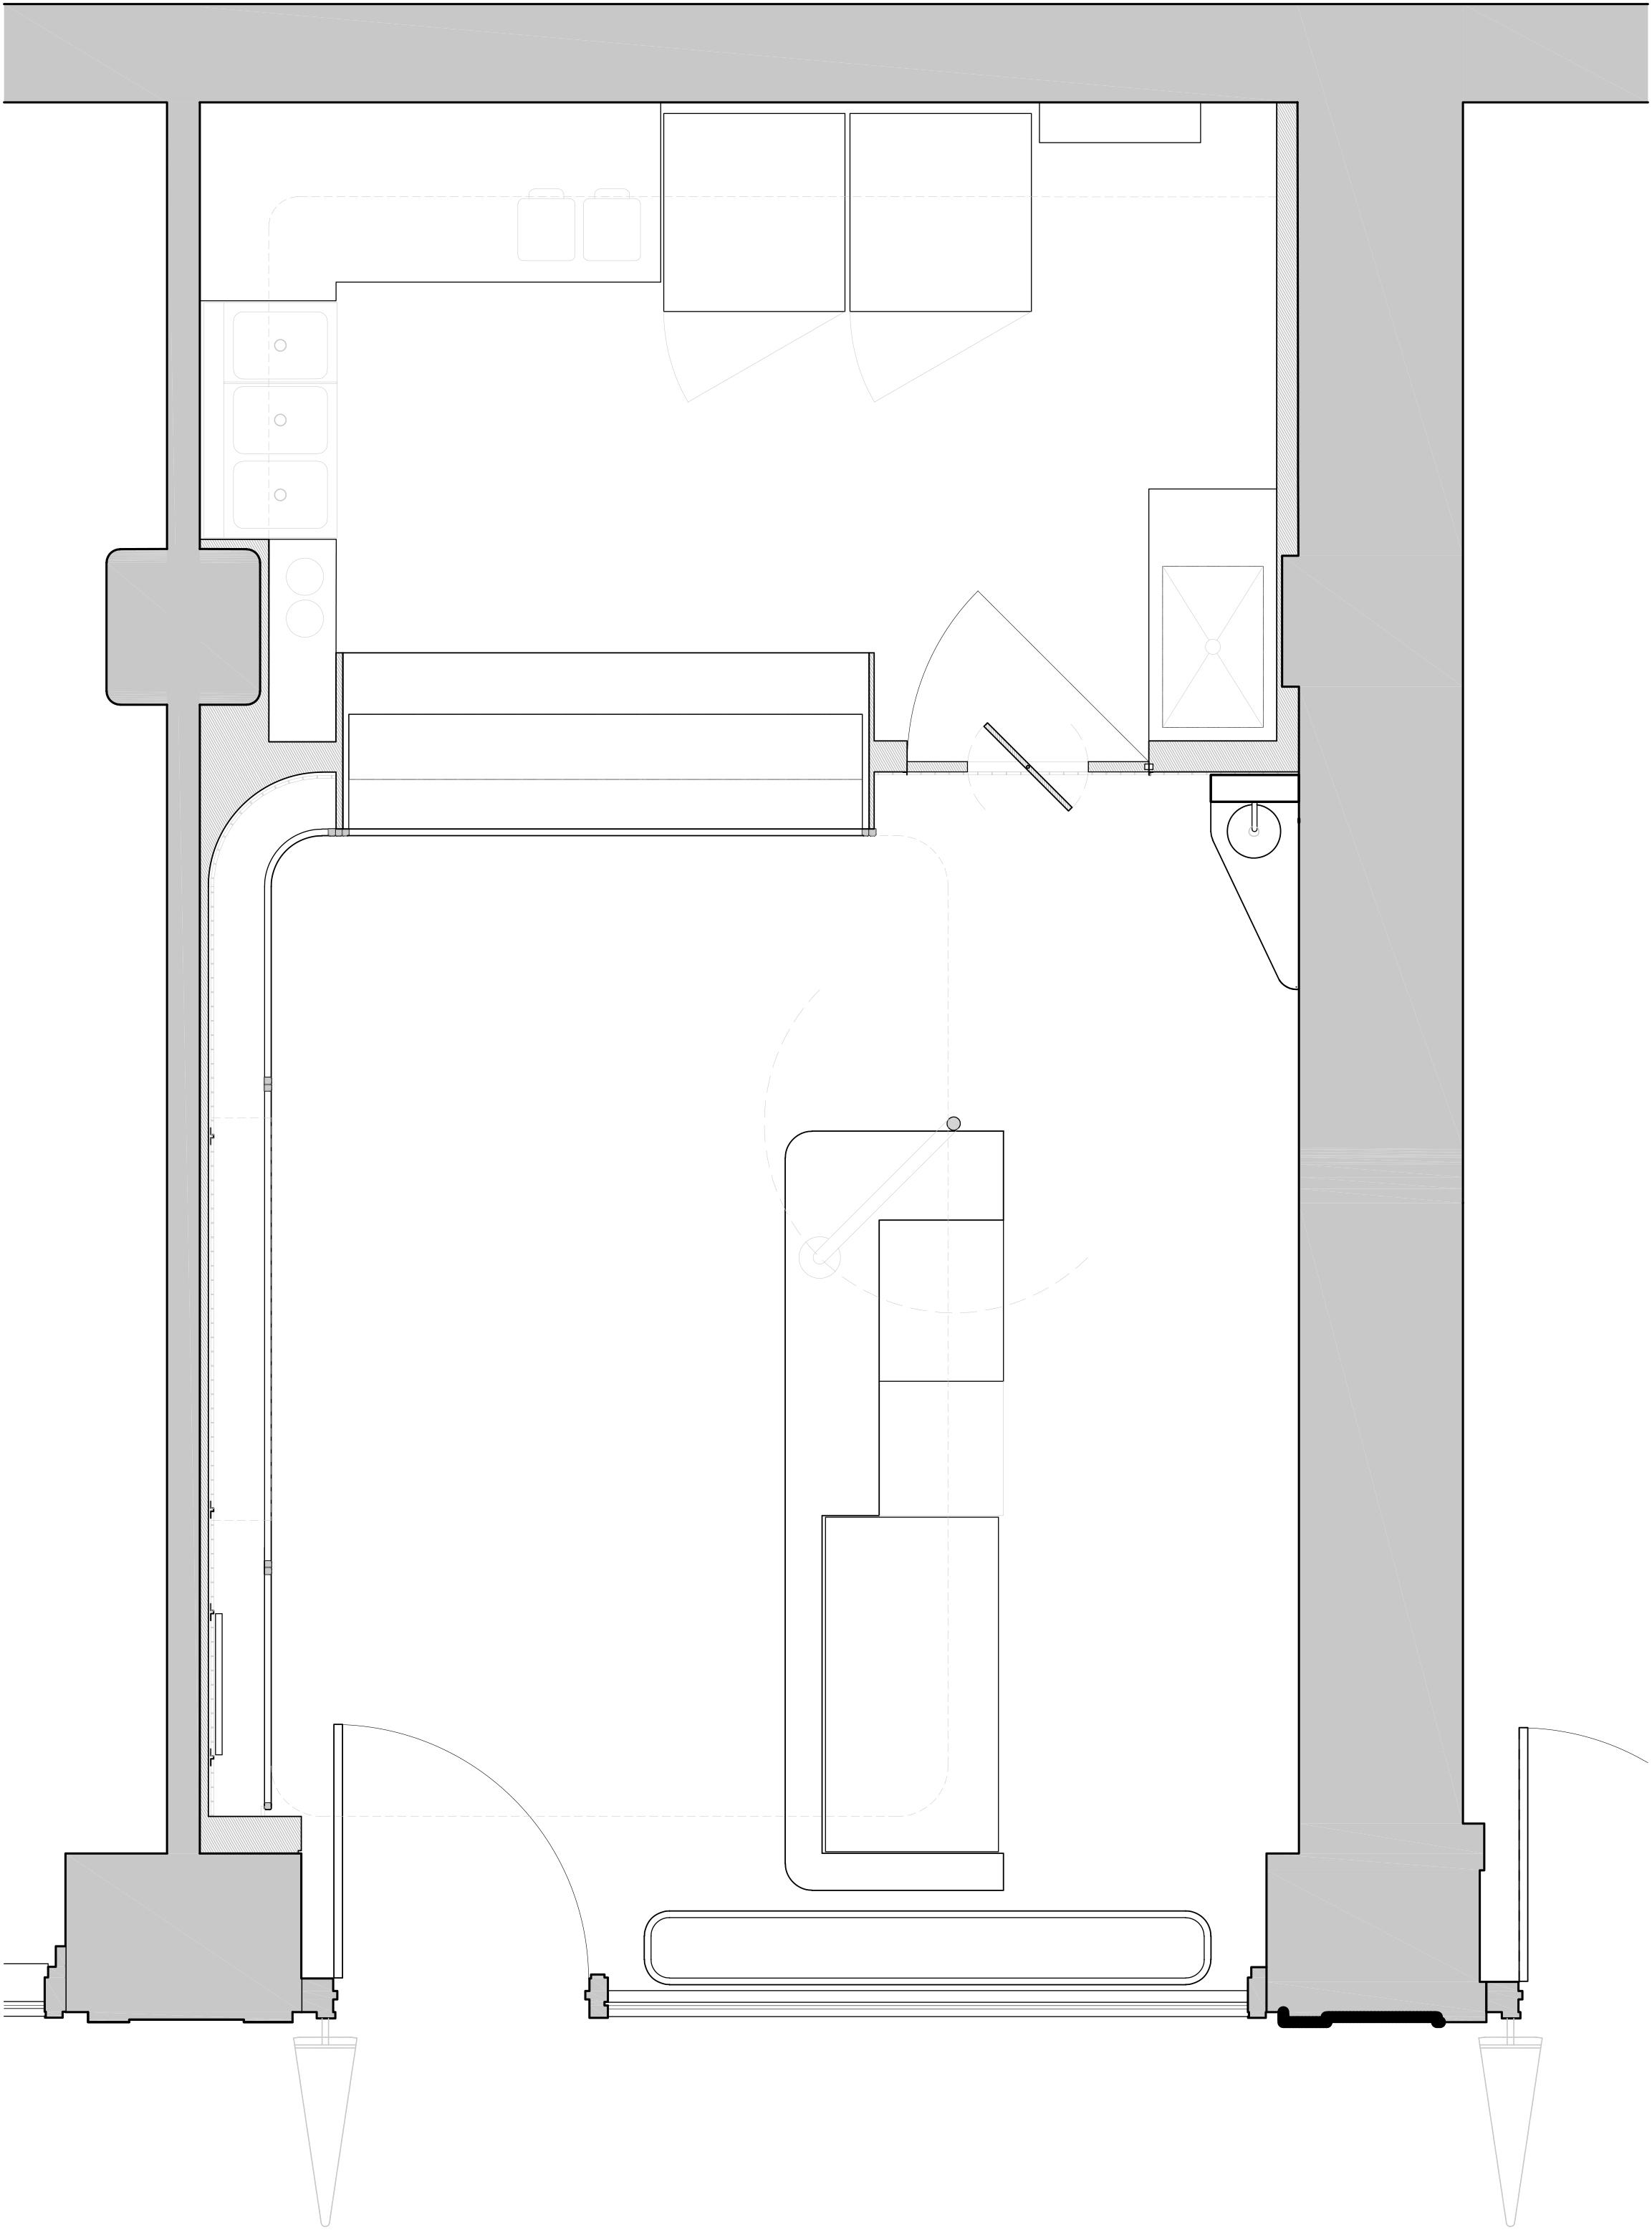 Valise_Union Station_Kilogram Studio_Plan.jpg